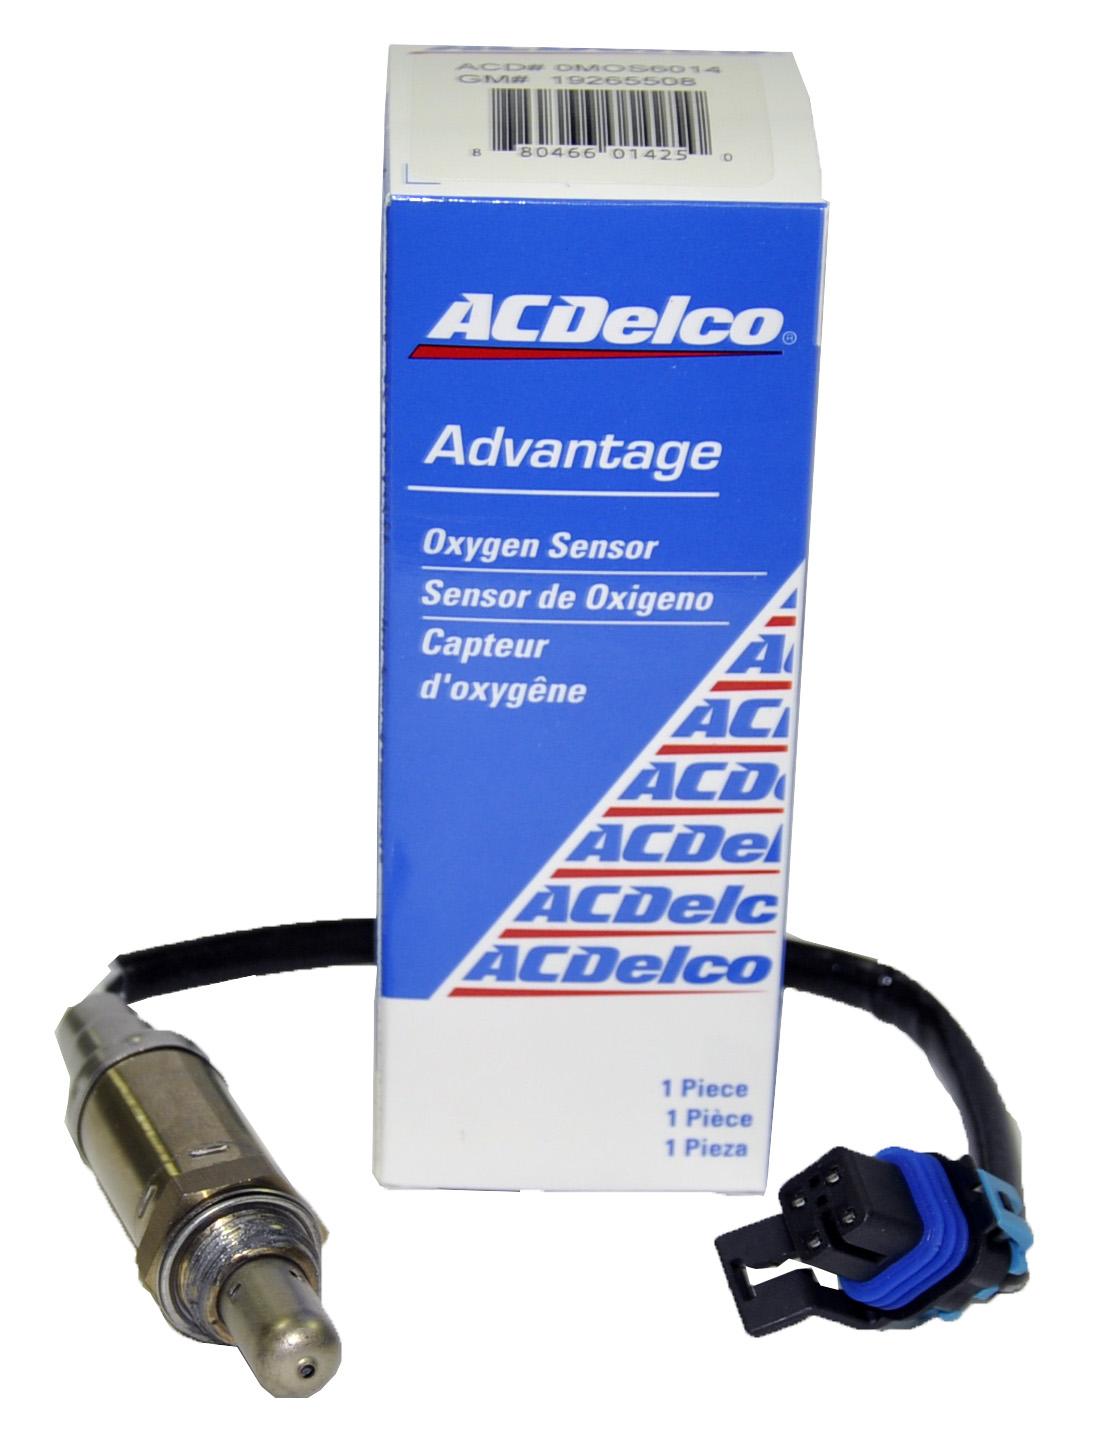 oxygen sensor wiring harness ac oxygen sensor wiring new acdelco 0mos6014 oxygen sensor for general motors | ebay